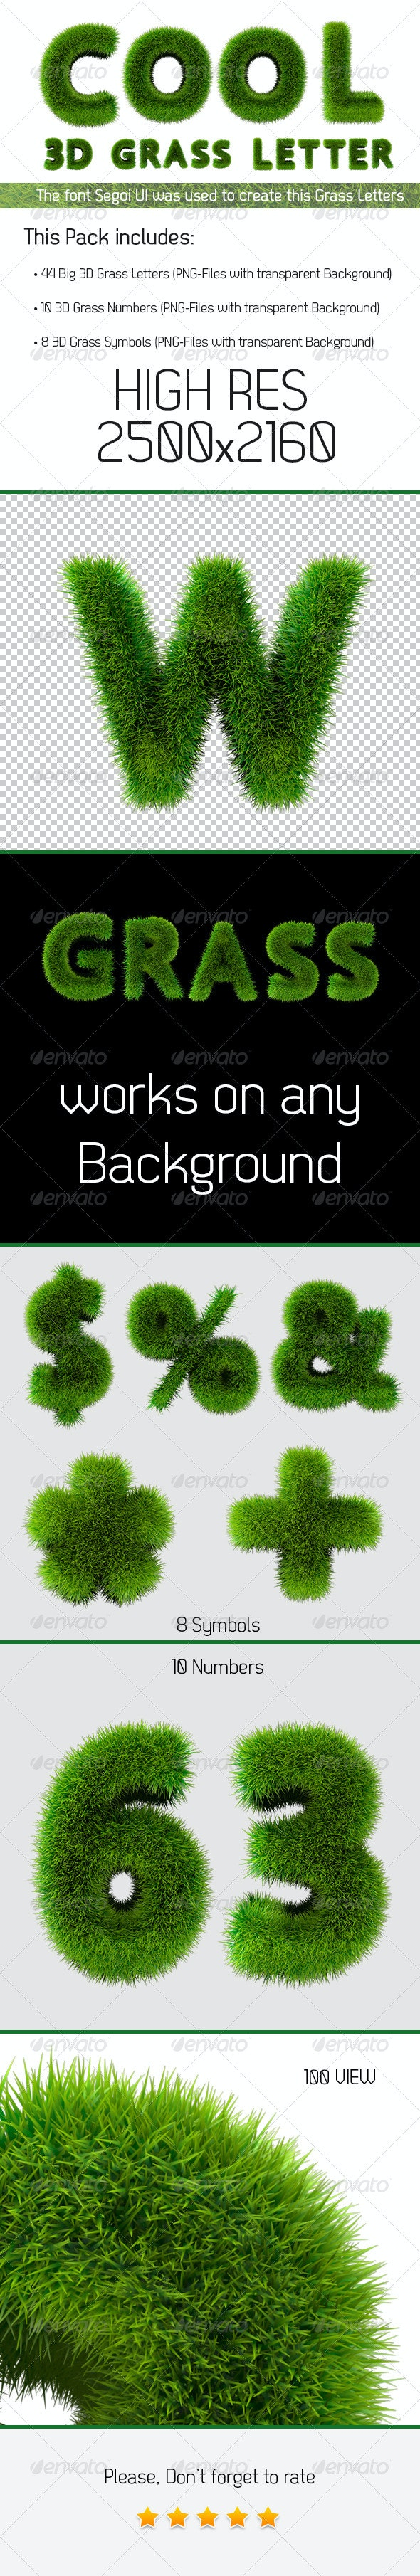 Grass Letters 3D - Text 3D Renders